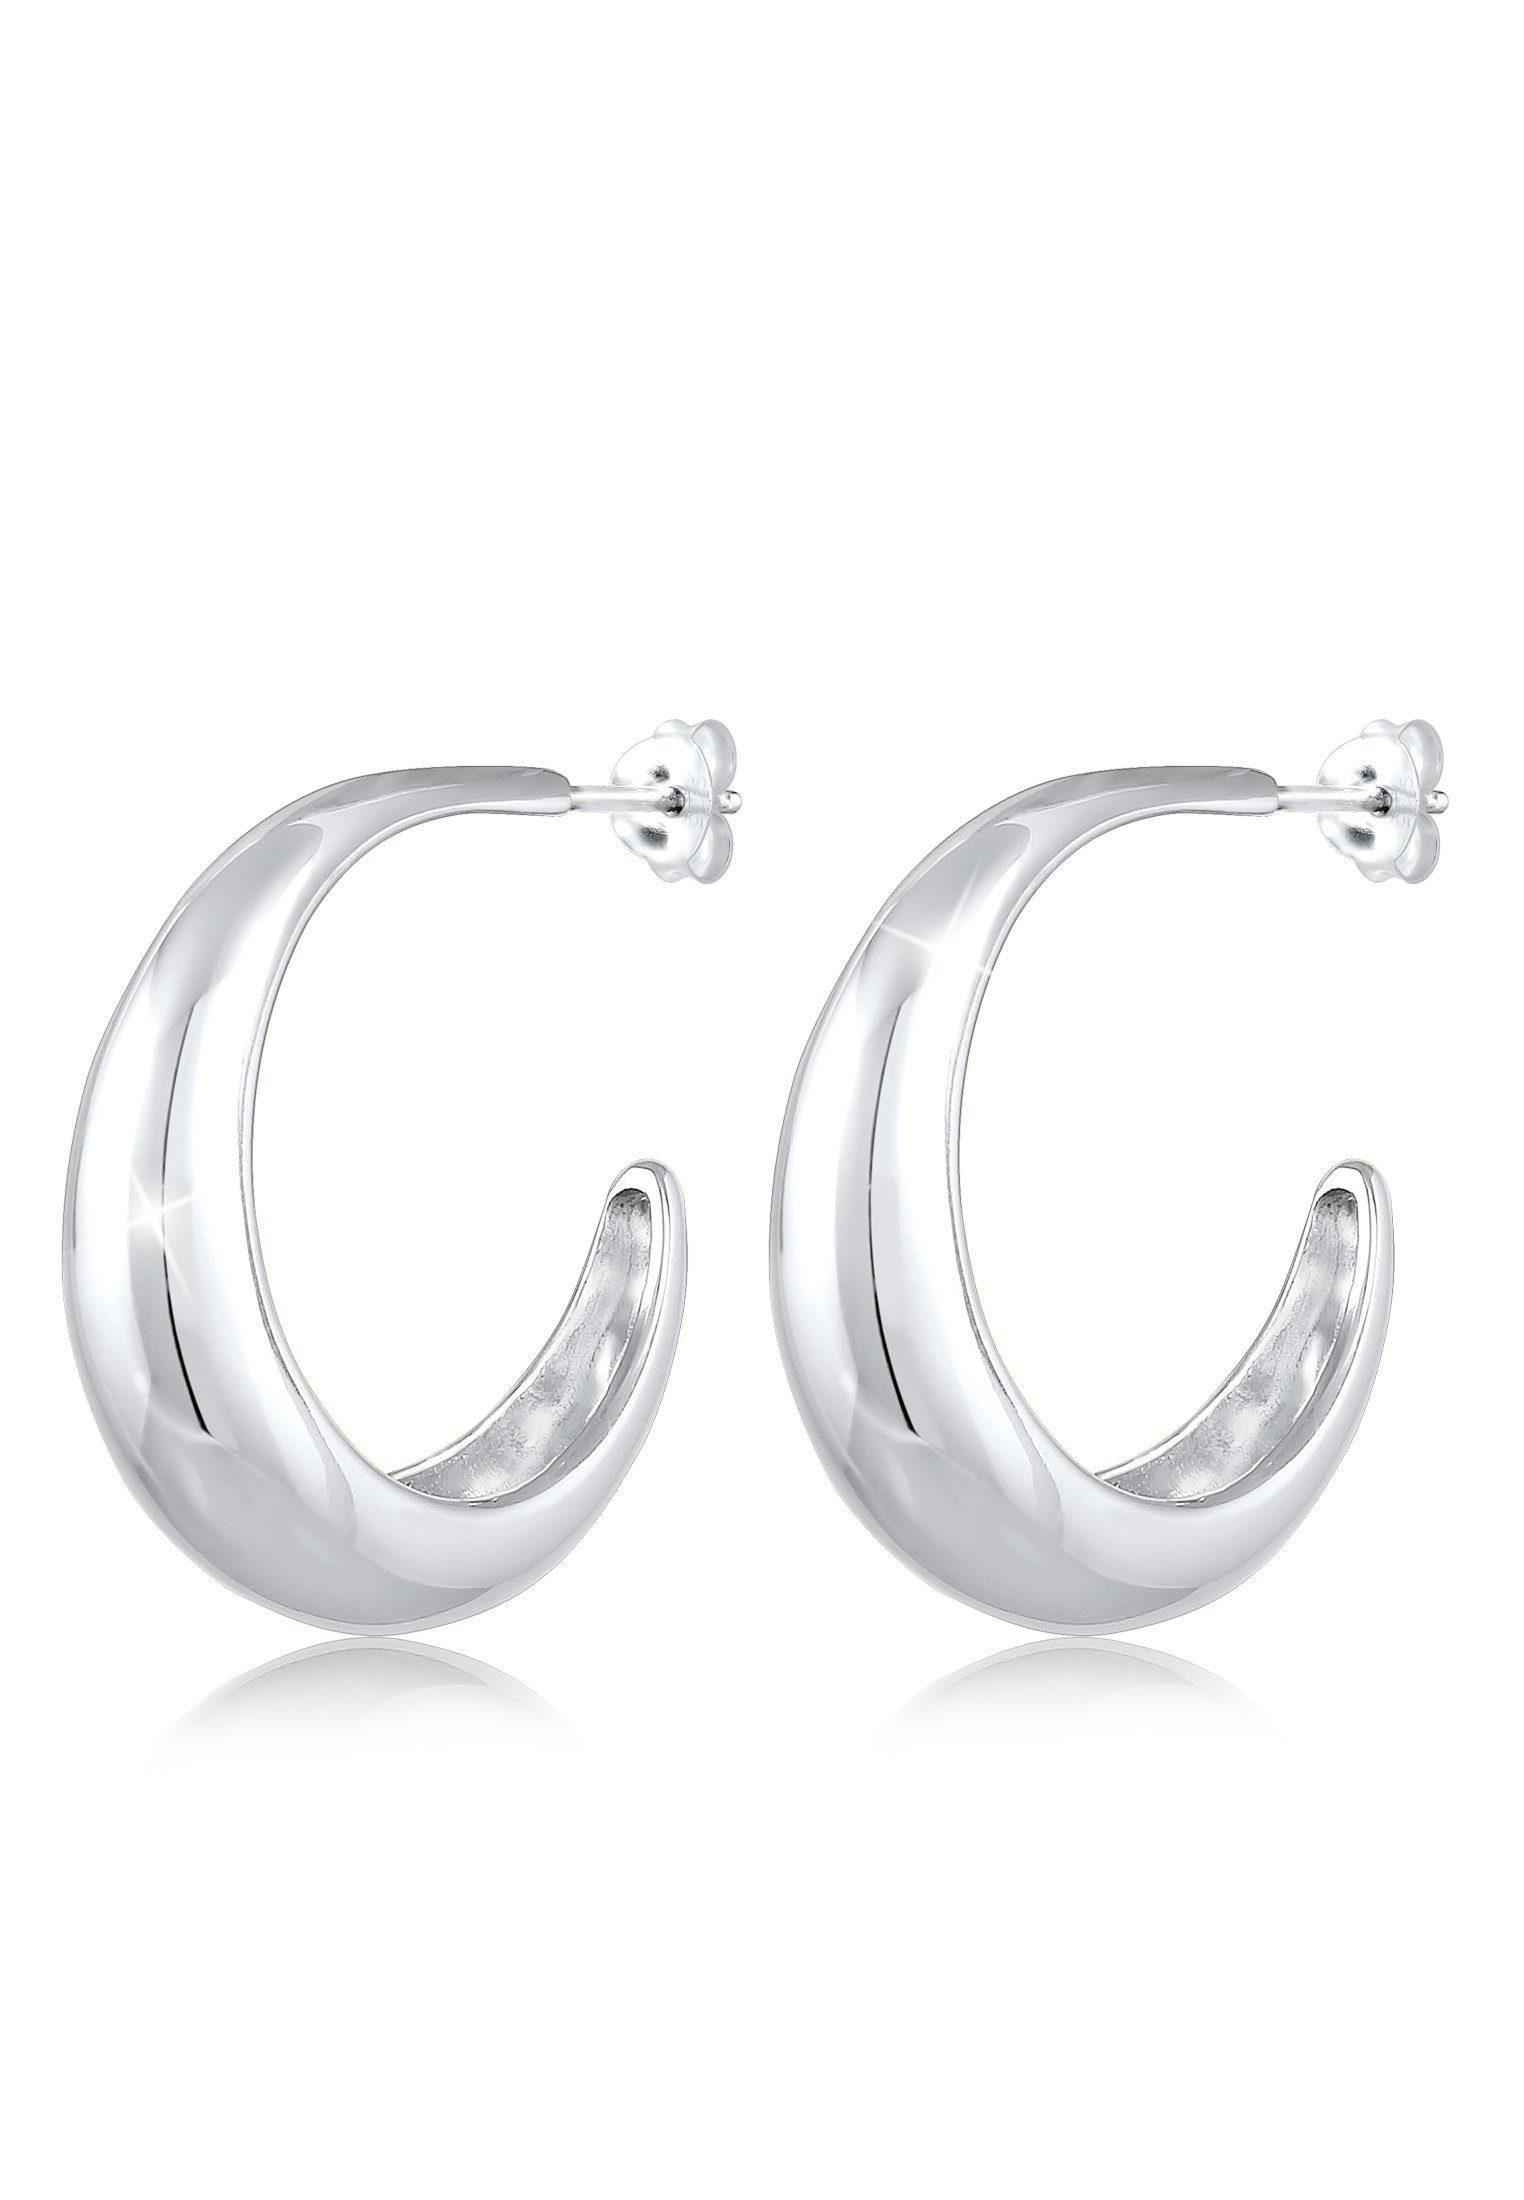 elli -  Paar Creolen Creolen Hänger Chunky Hoops Basic Cool 925 Silber